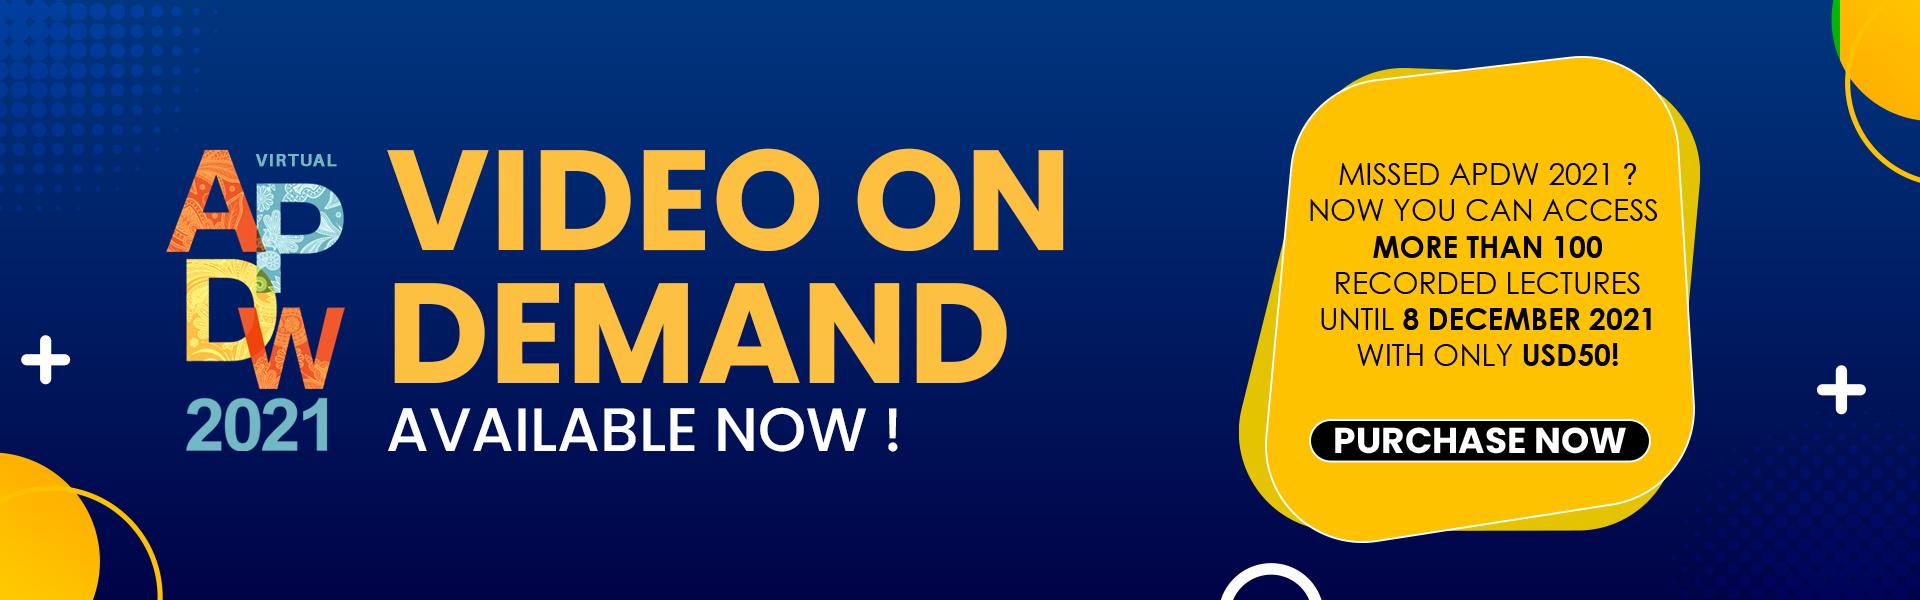 Video On Demand v2